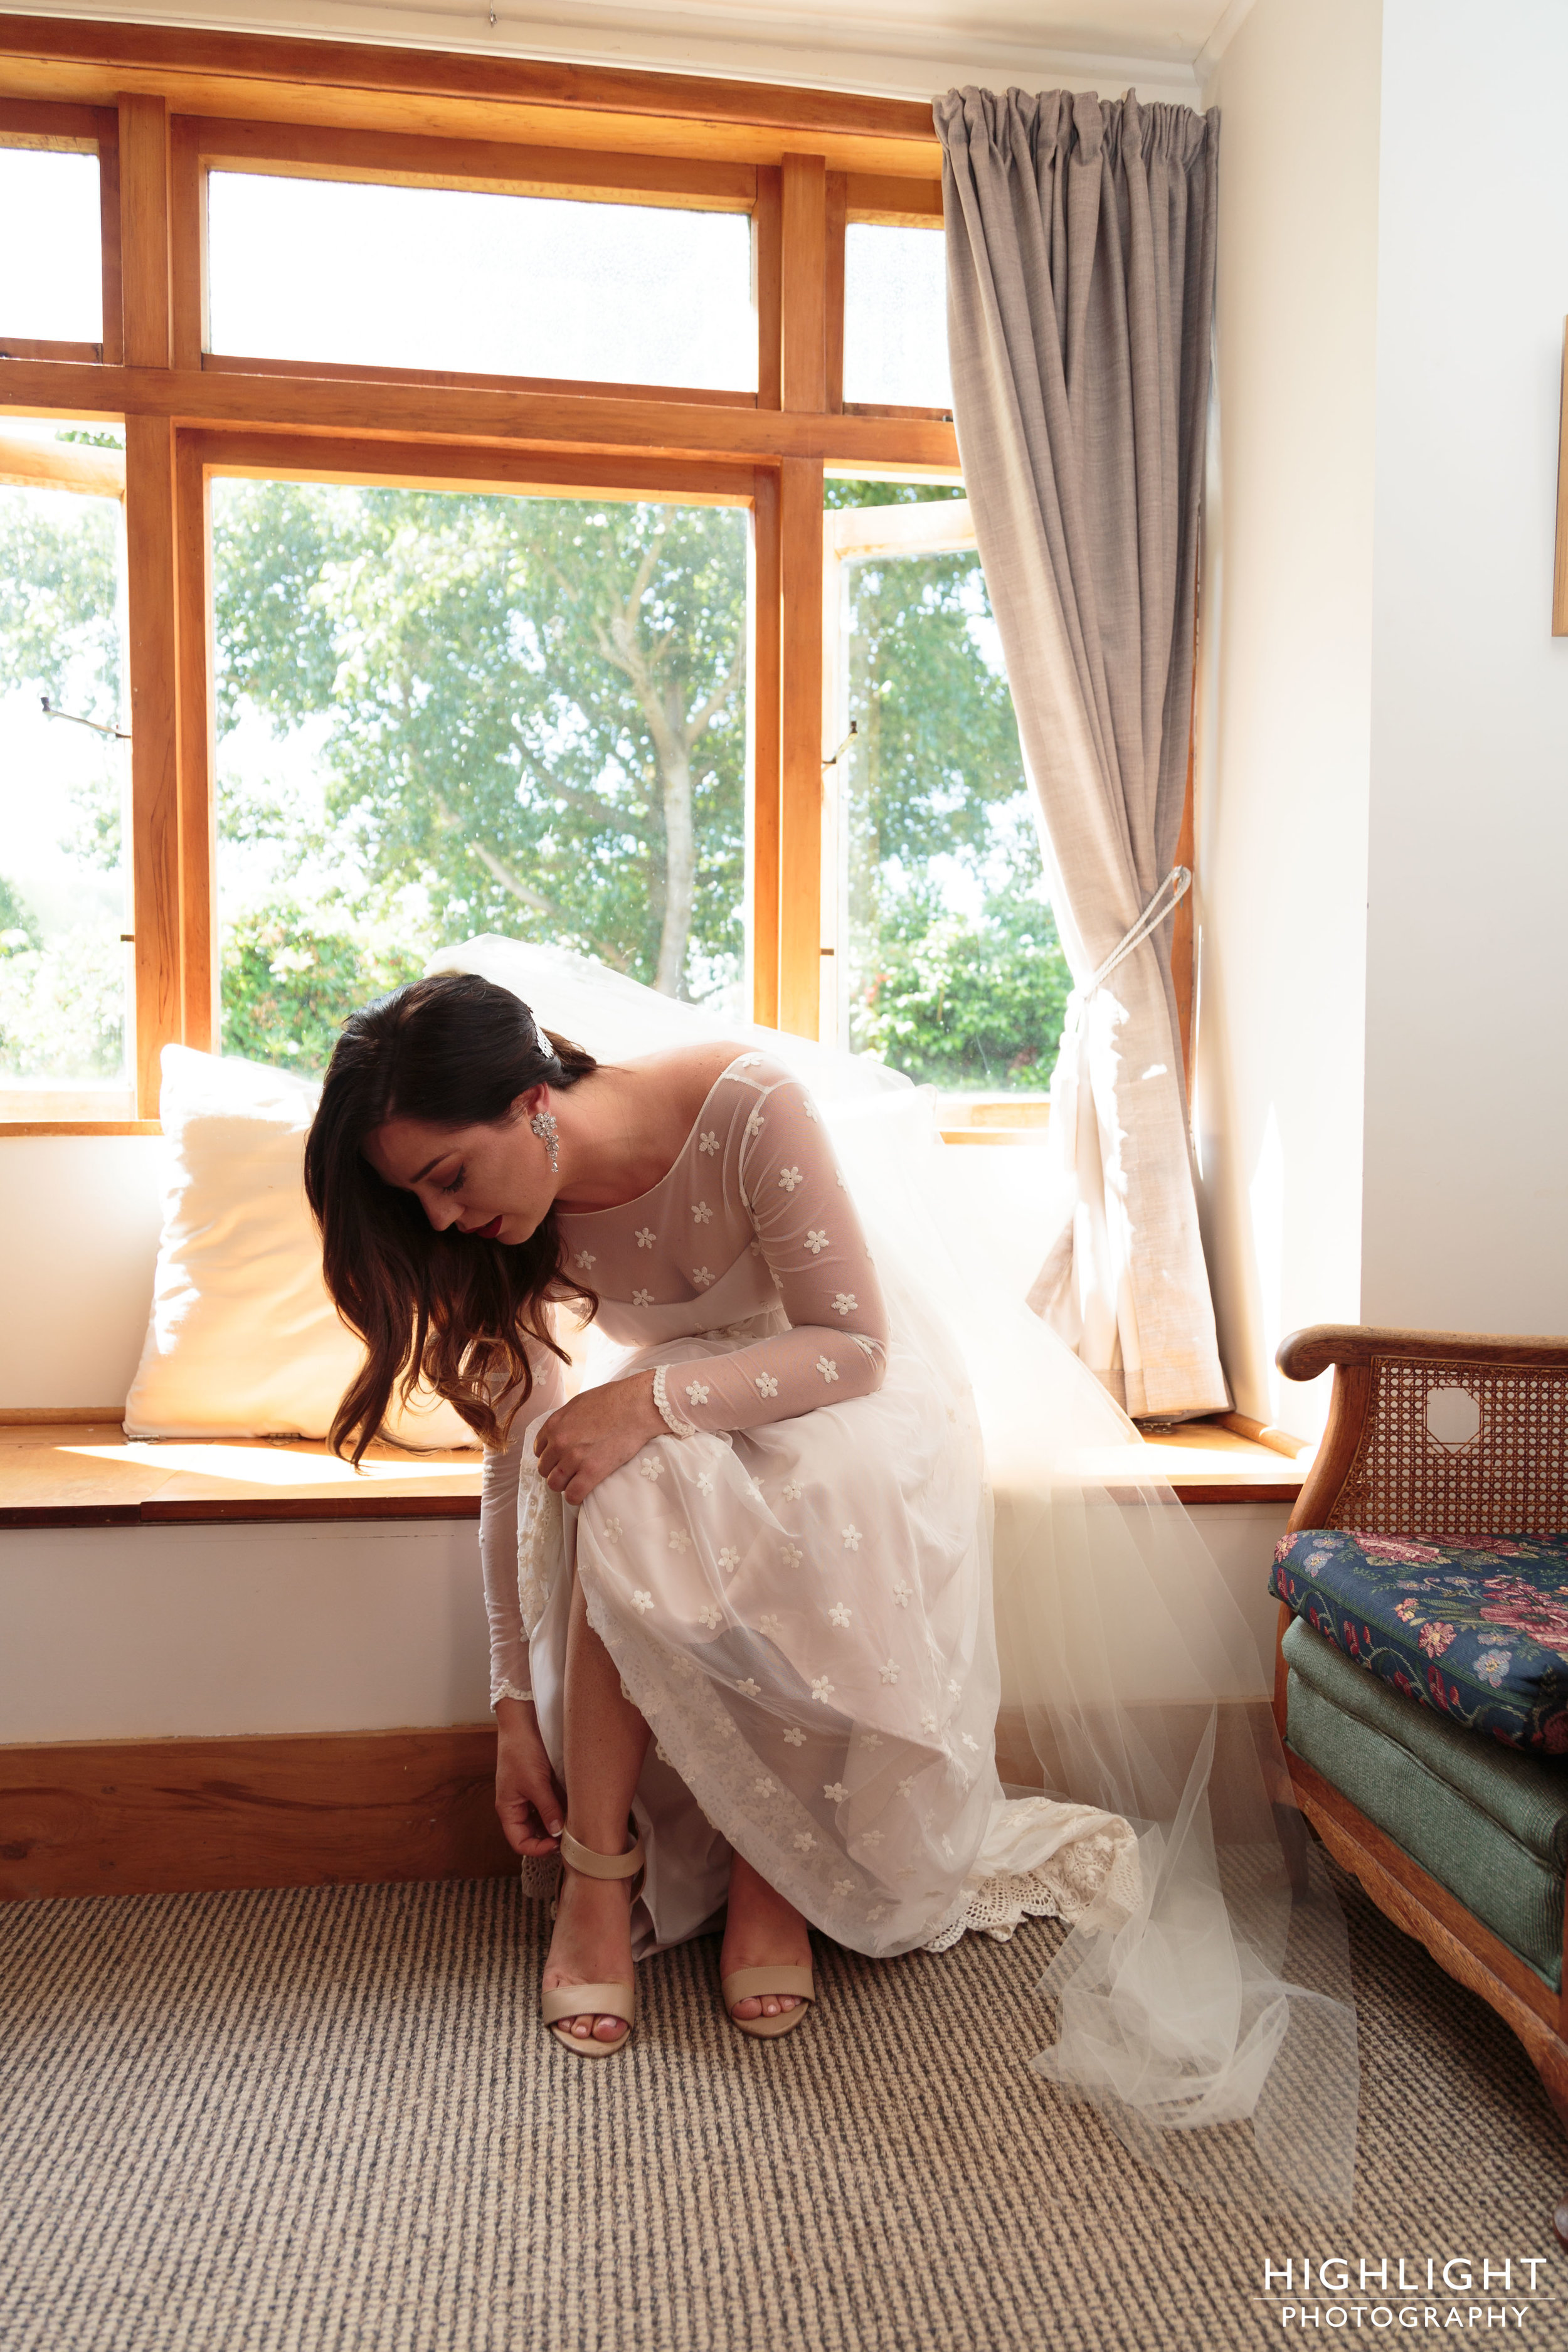 highlight-wedding-photography-new-zealand-makoura-lodge-wedding-31.jpg